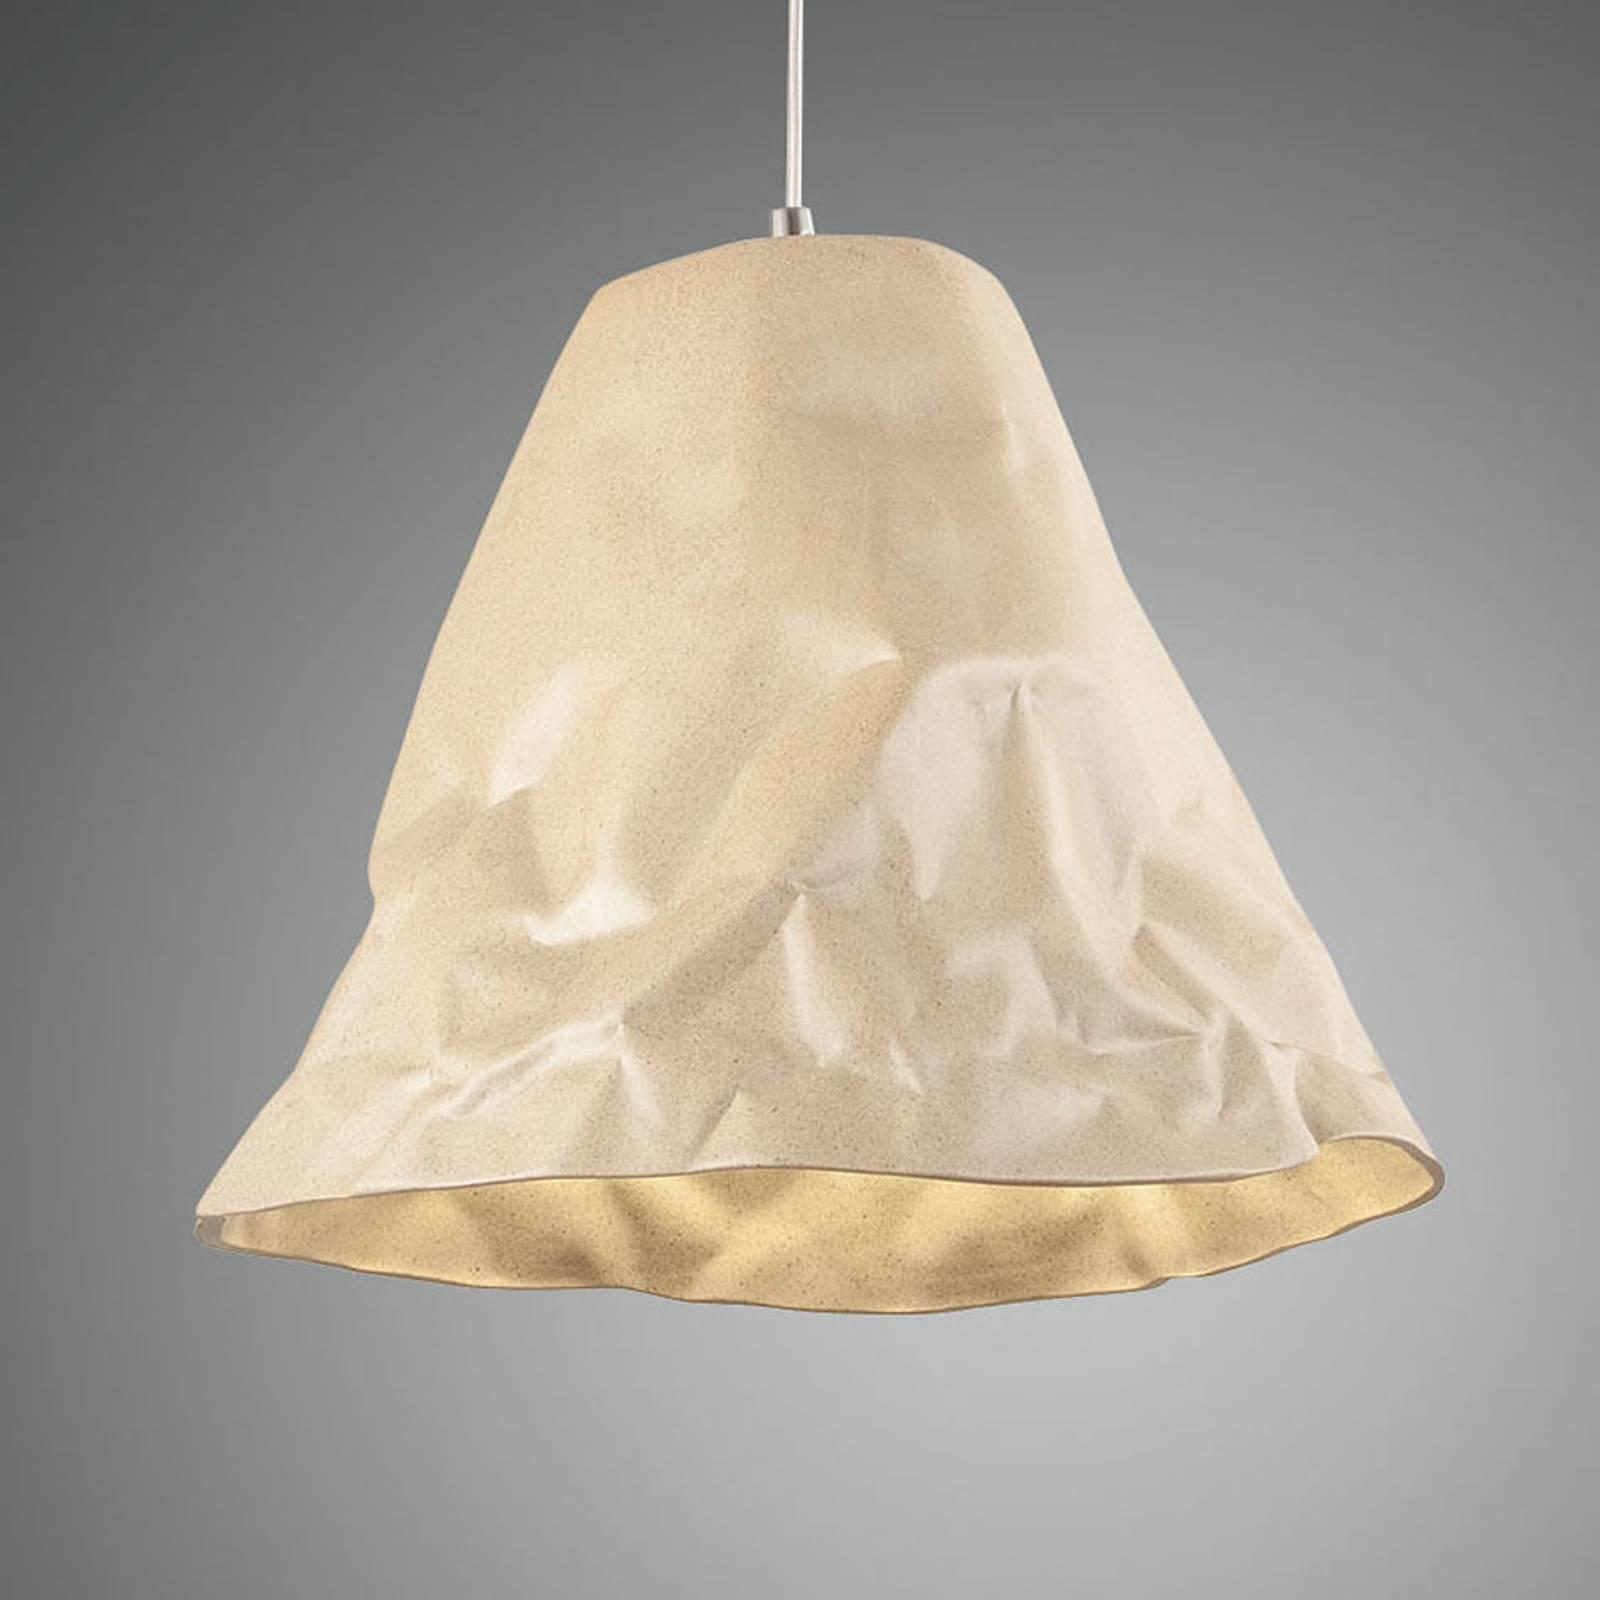 Lampa wisząca Crumple z ceramiki, khaki